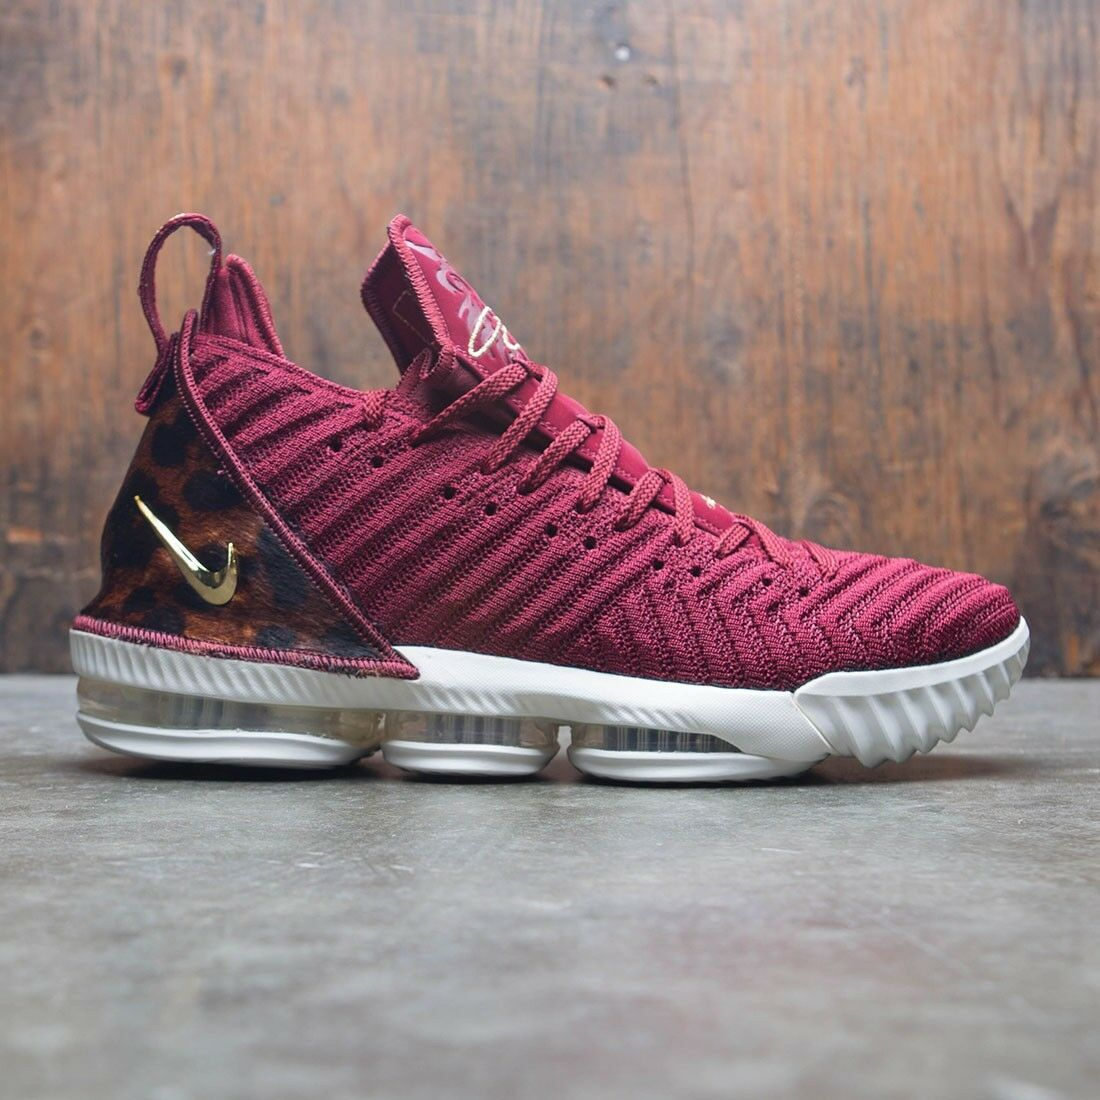 Nike LeBron 16 XVI King Red gold Size 15. AO2588-601